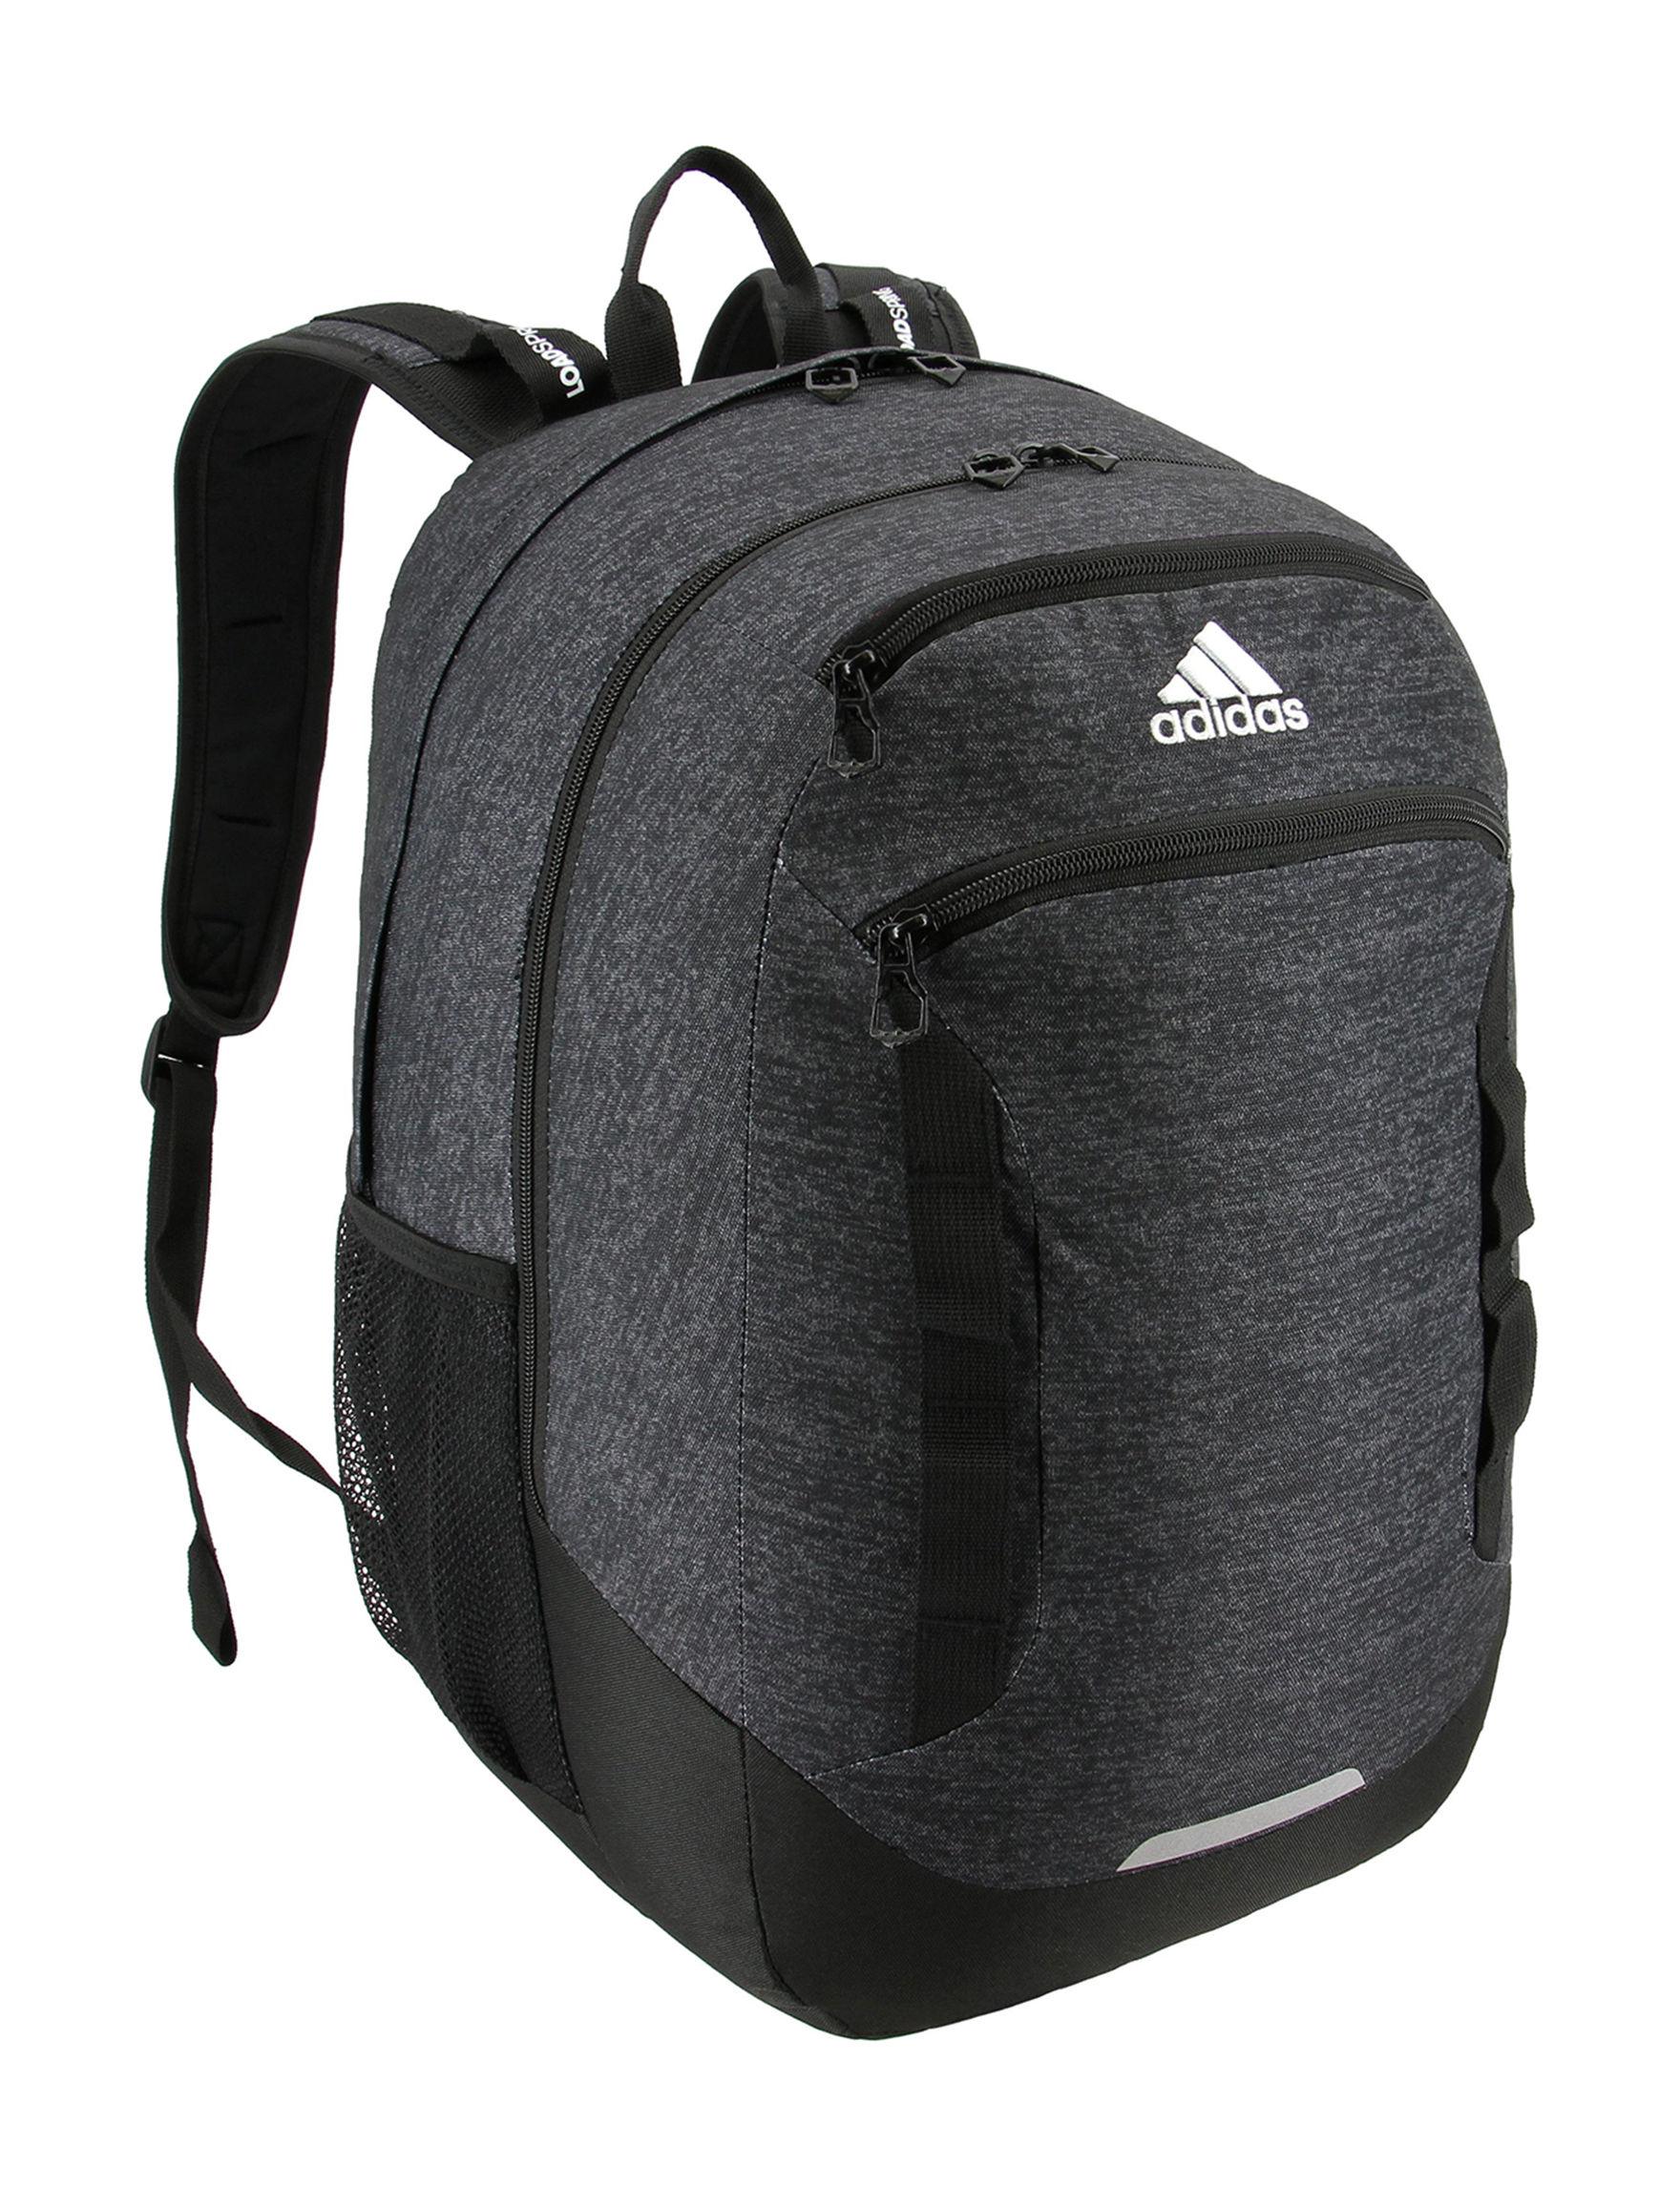 Adidas Black Bookbags & Backpacks